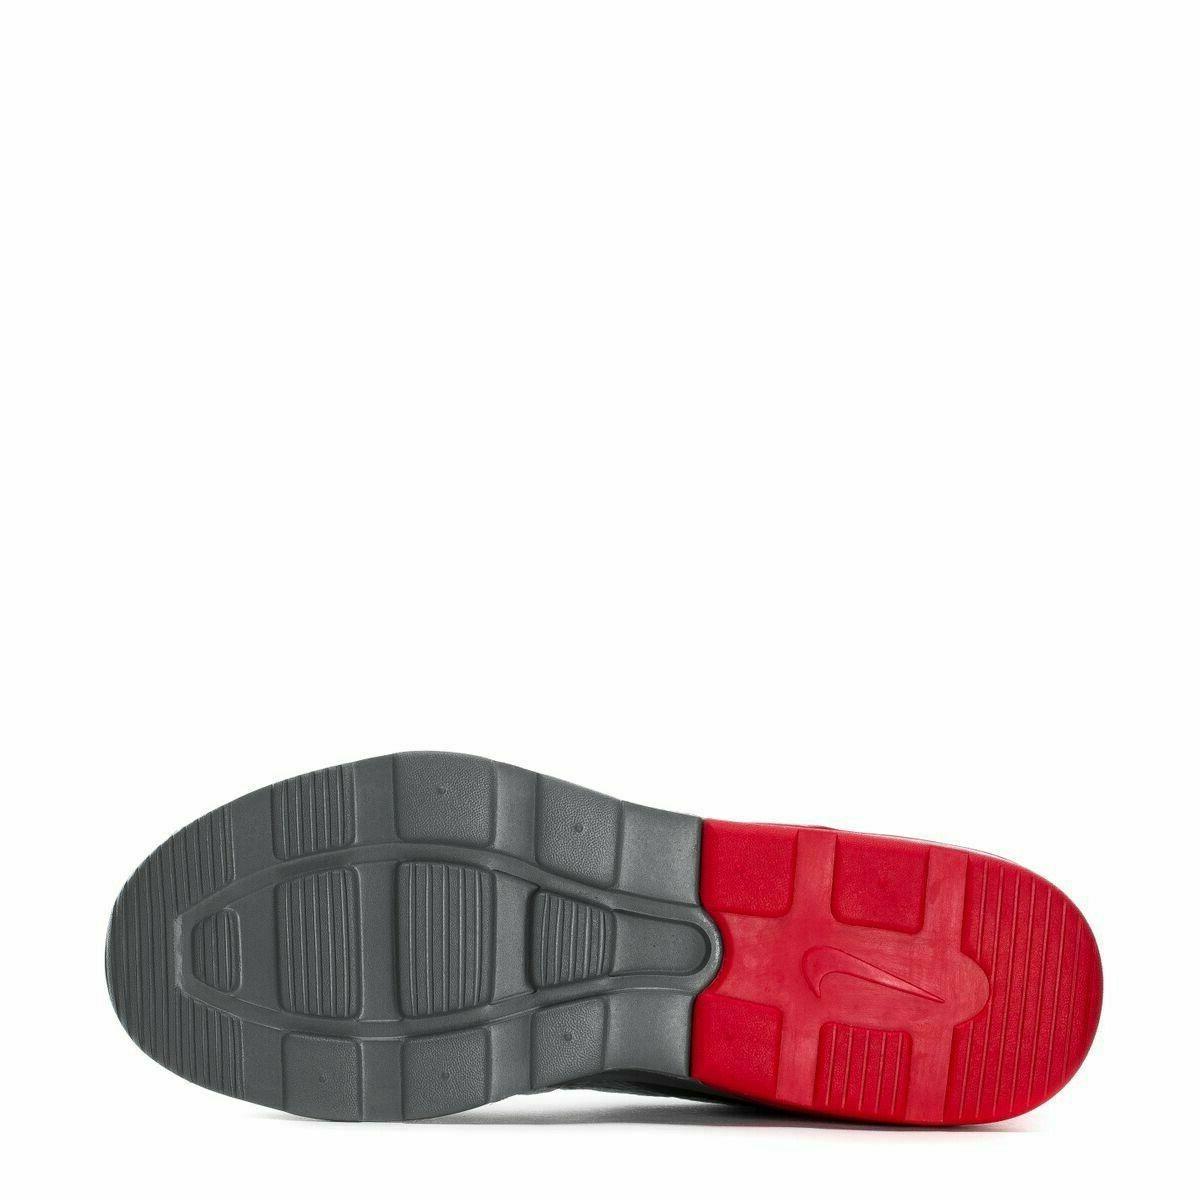 Nike Max 2 Mens Running Shoes CI7589 001 University